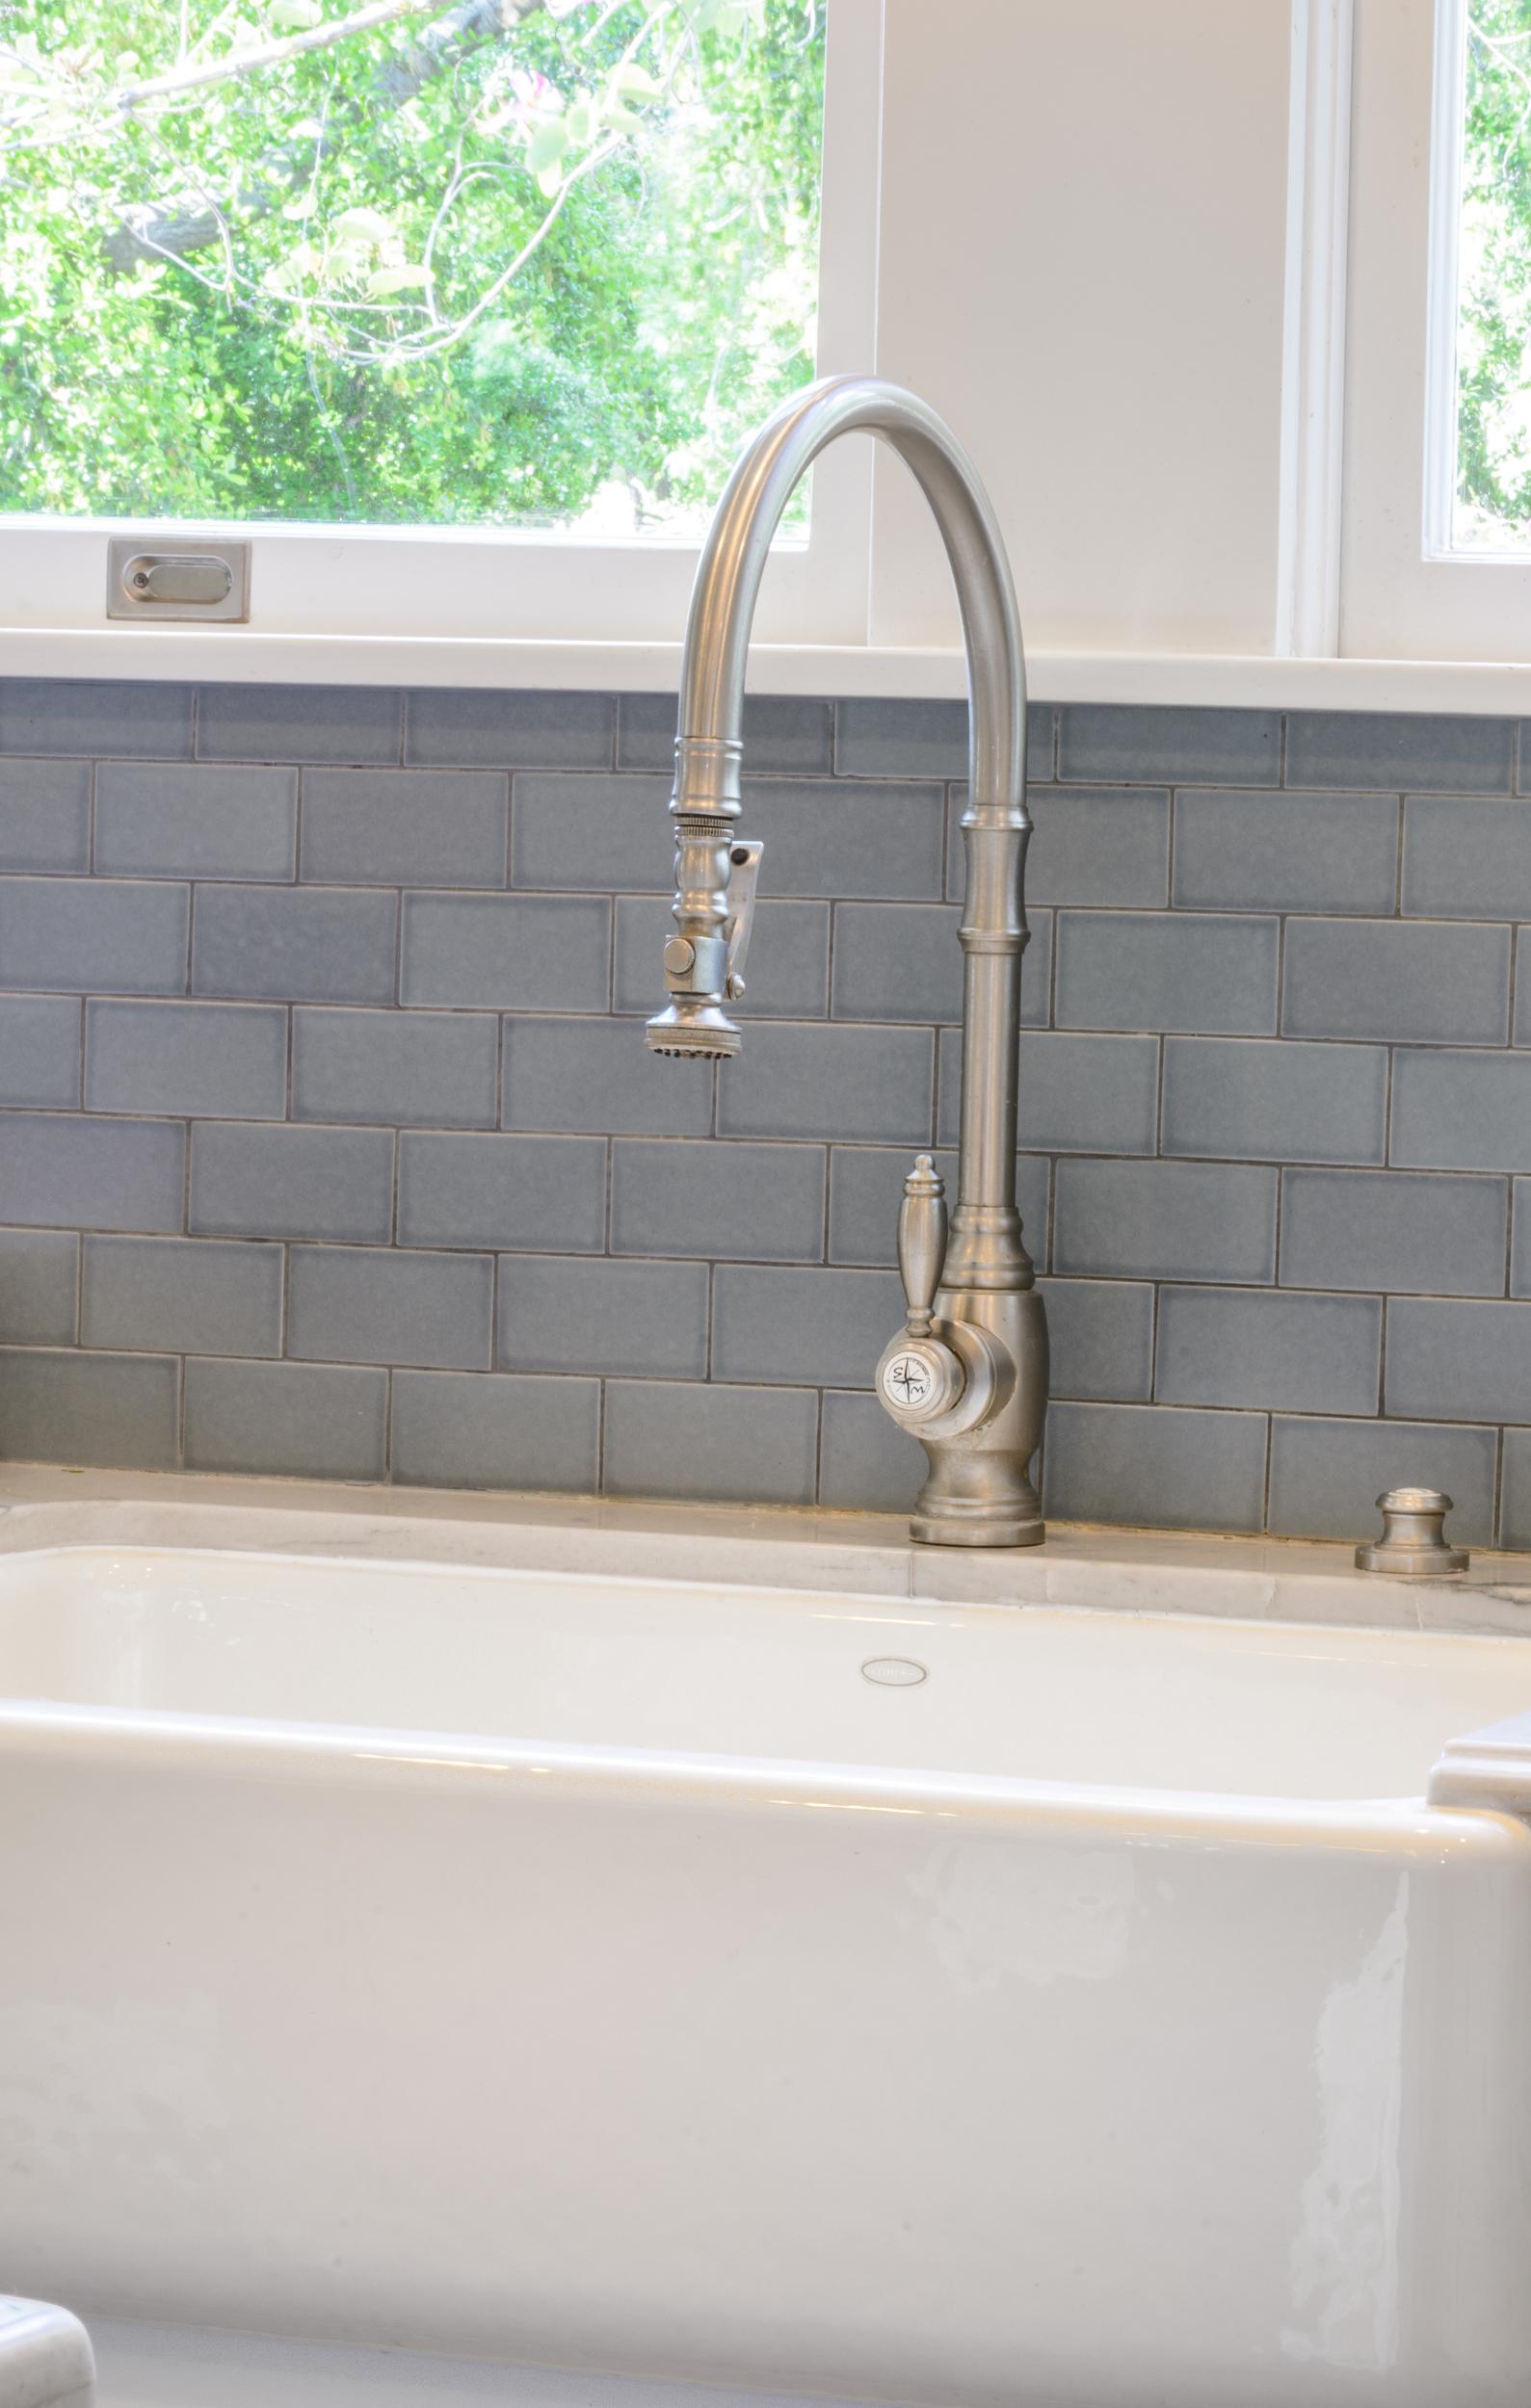 Traditional-Craftsman-Kitchen-Farmers-Sink-Gooseneck-Faucet.jpg